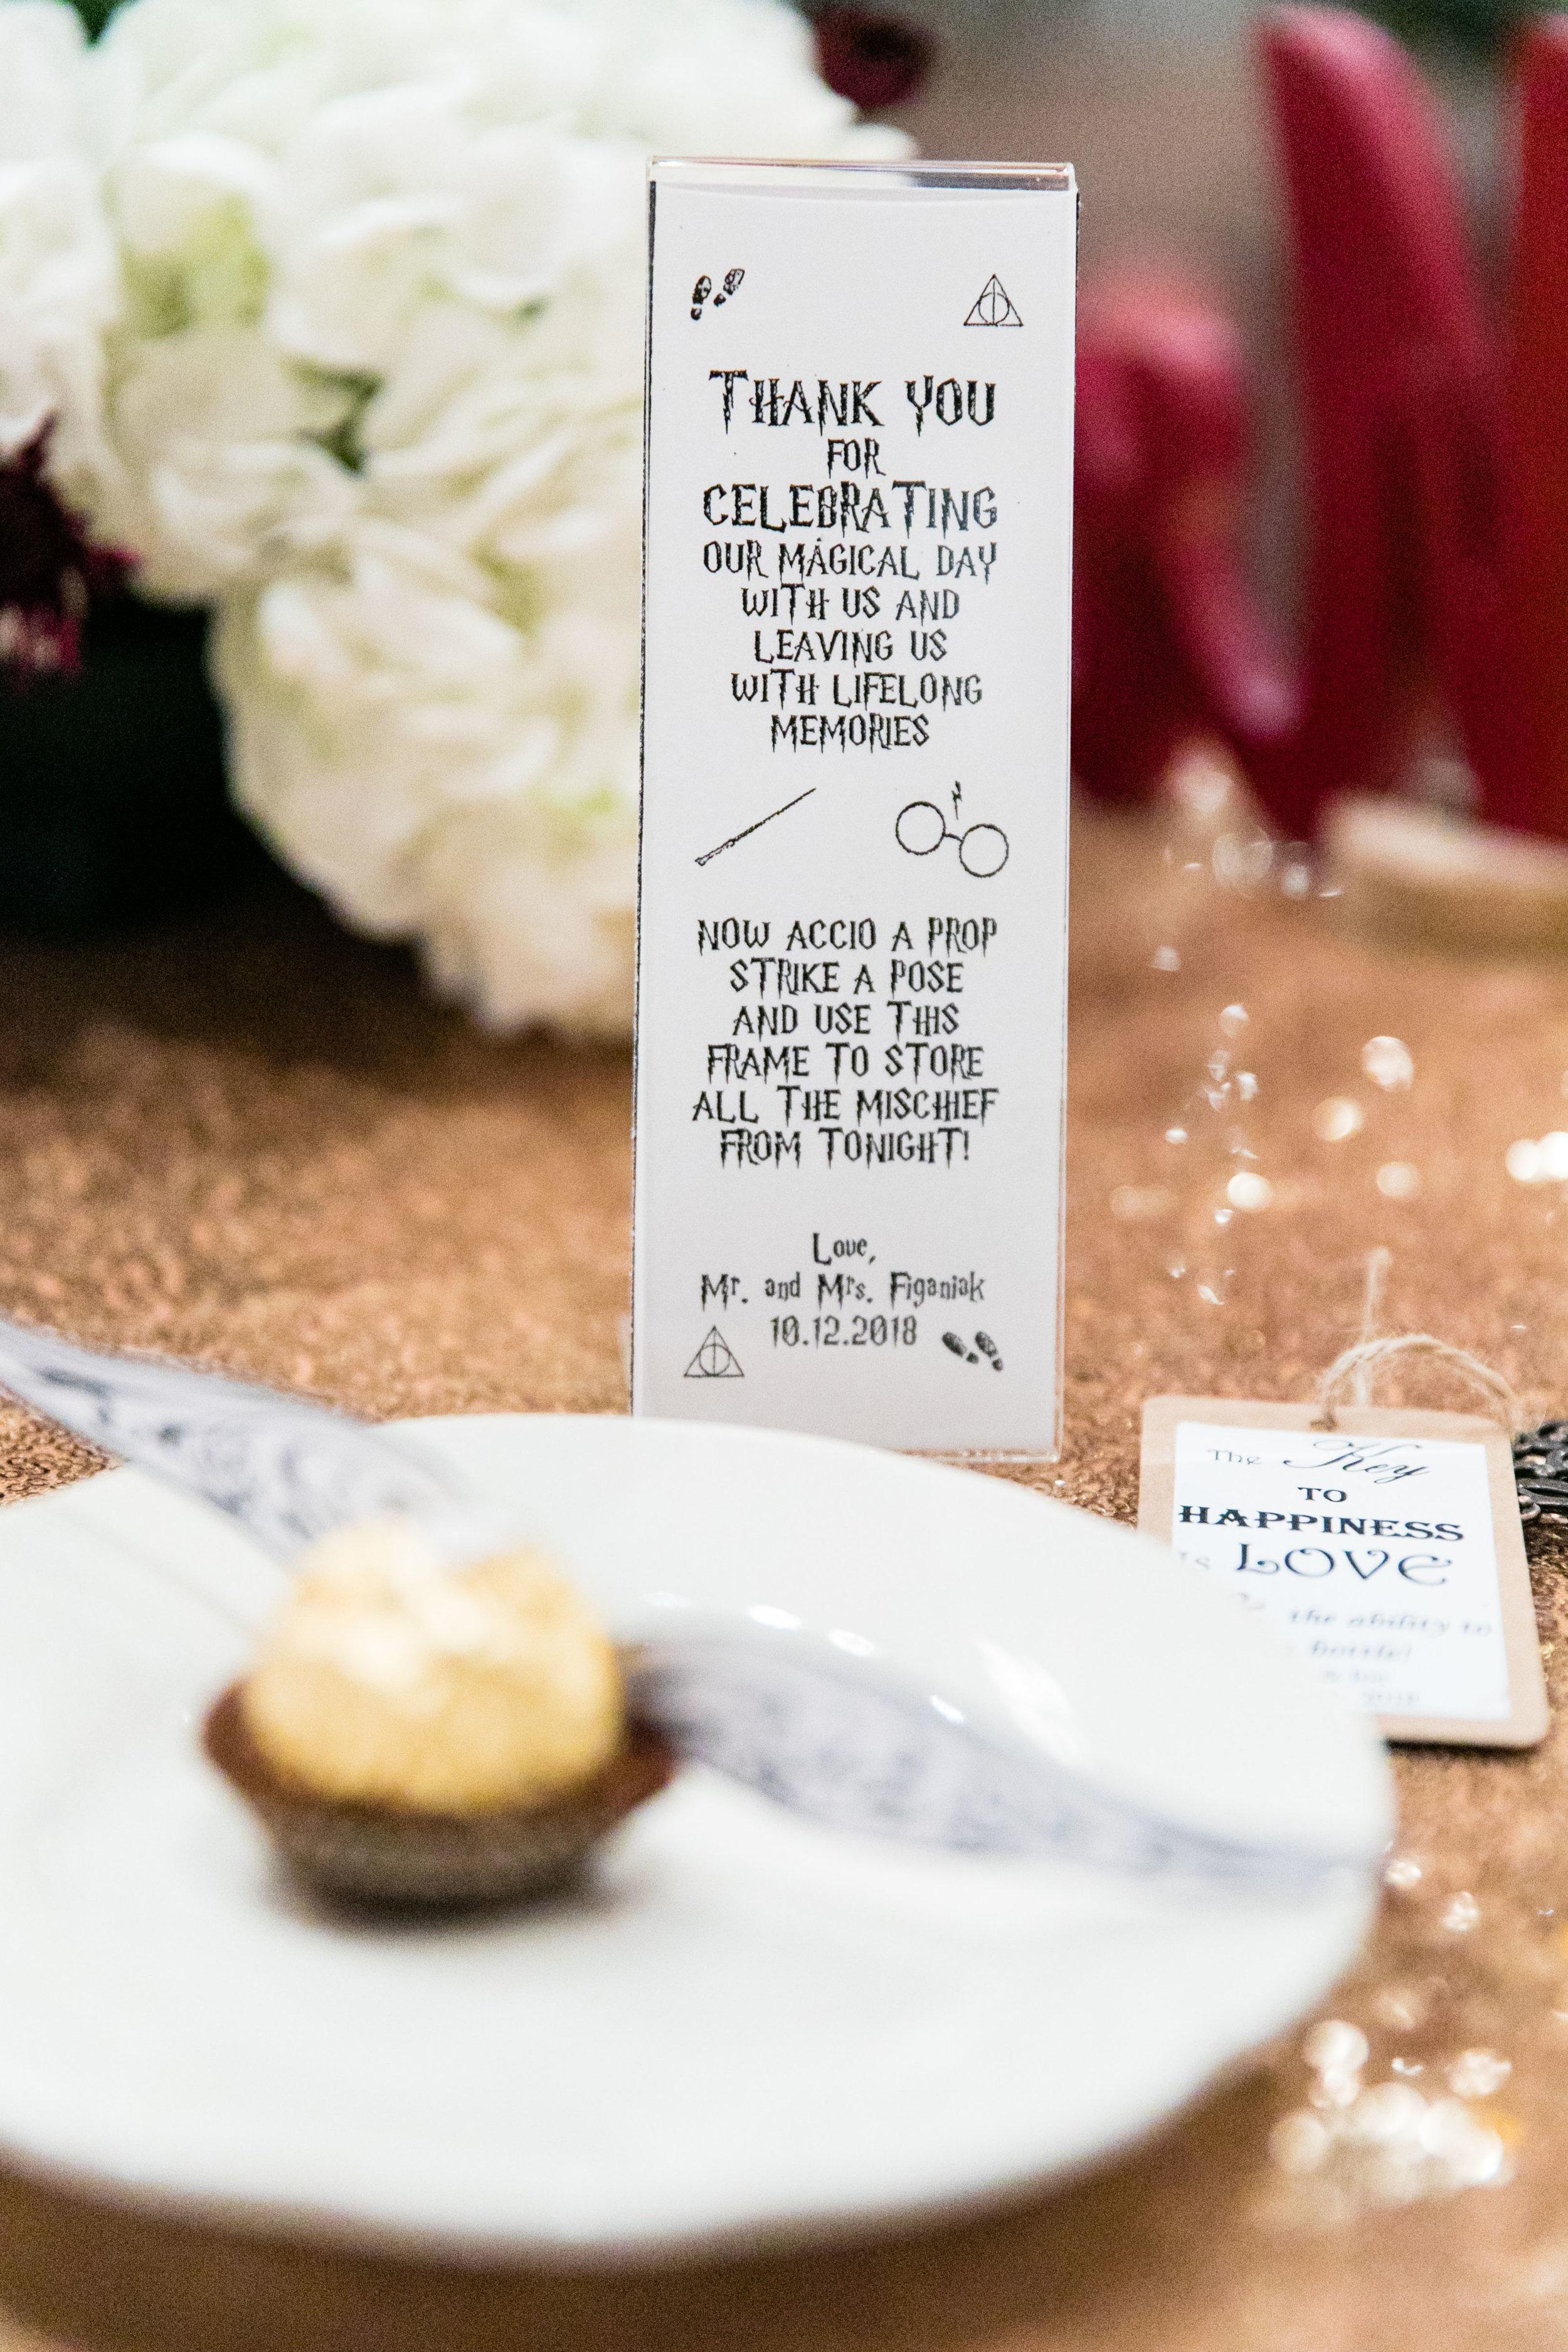 Ashly and Joe - Felt Factory Wedding - Harry Potter Themed Wedding - 105.jpg